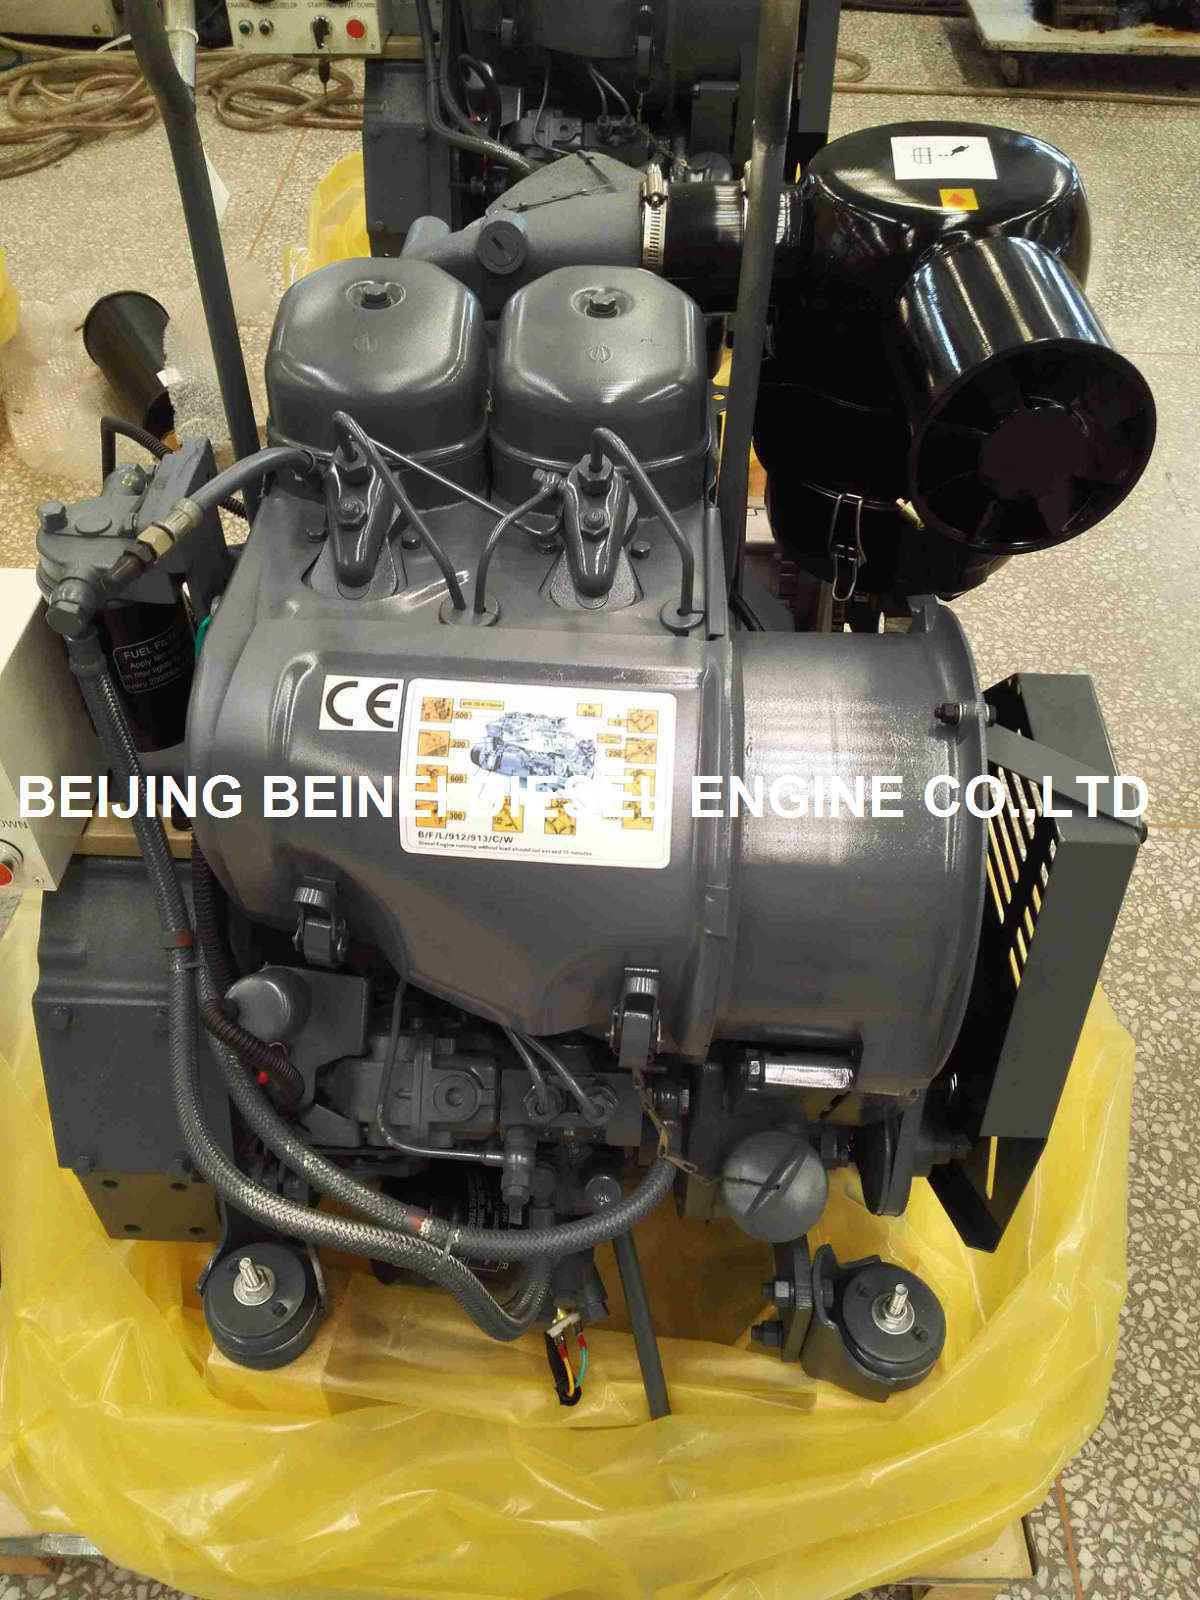 Genset Diesel Engine Air Cooled F2l912 1500 Rpm